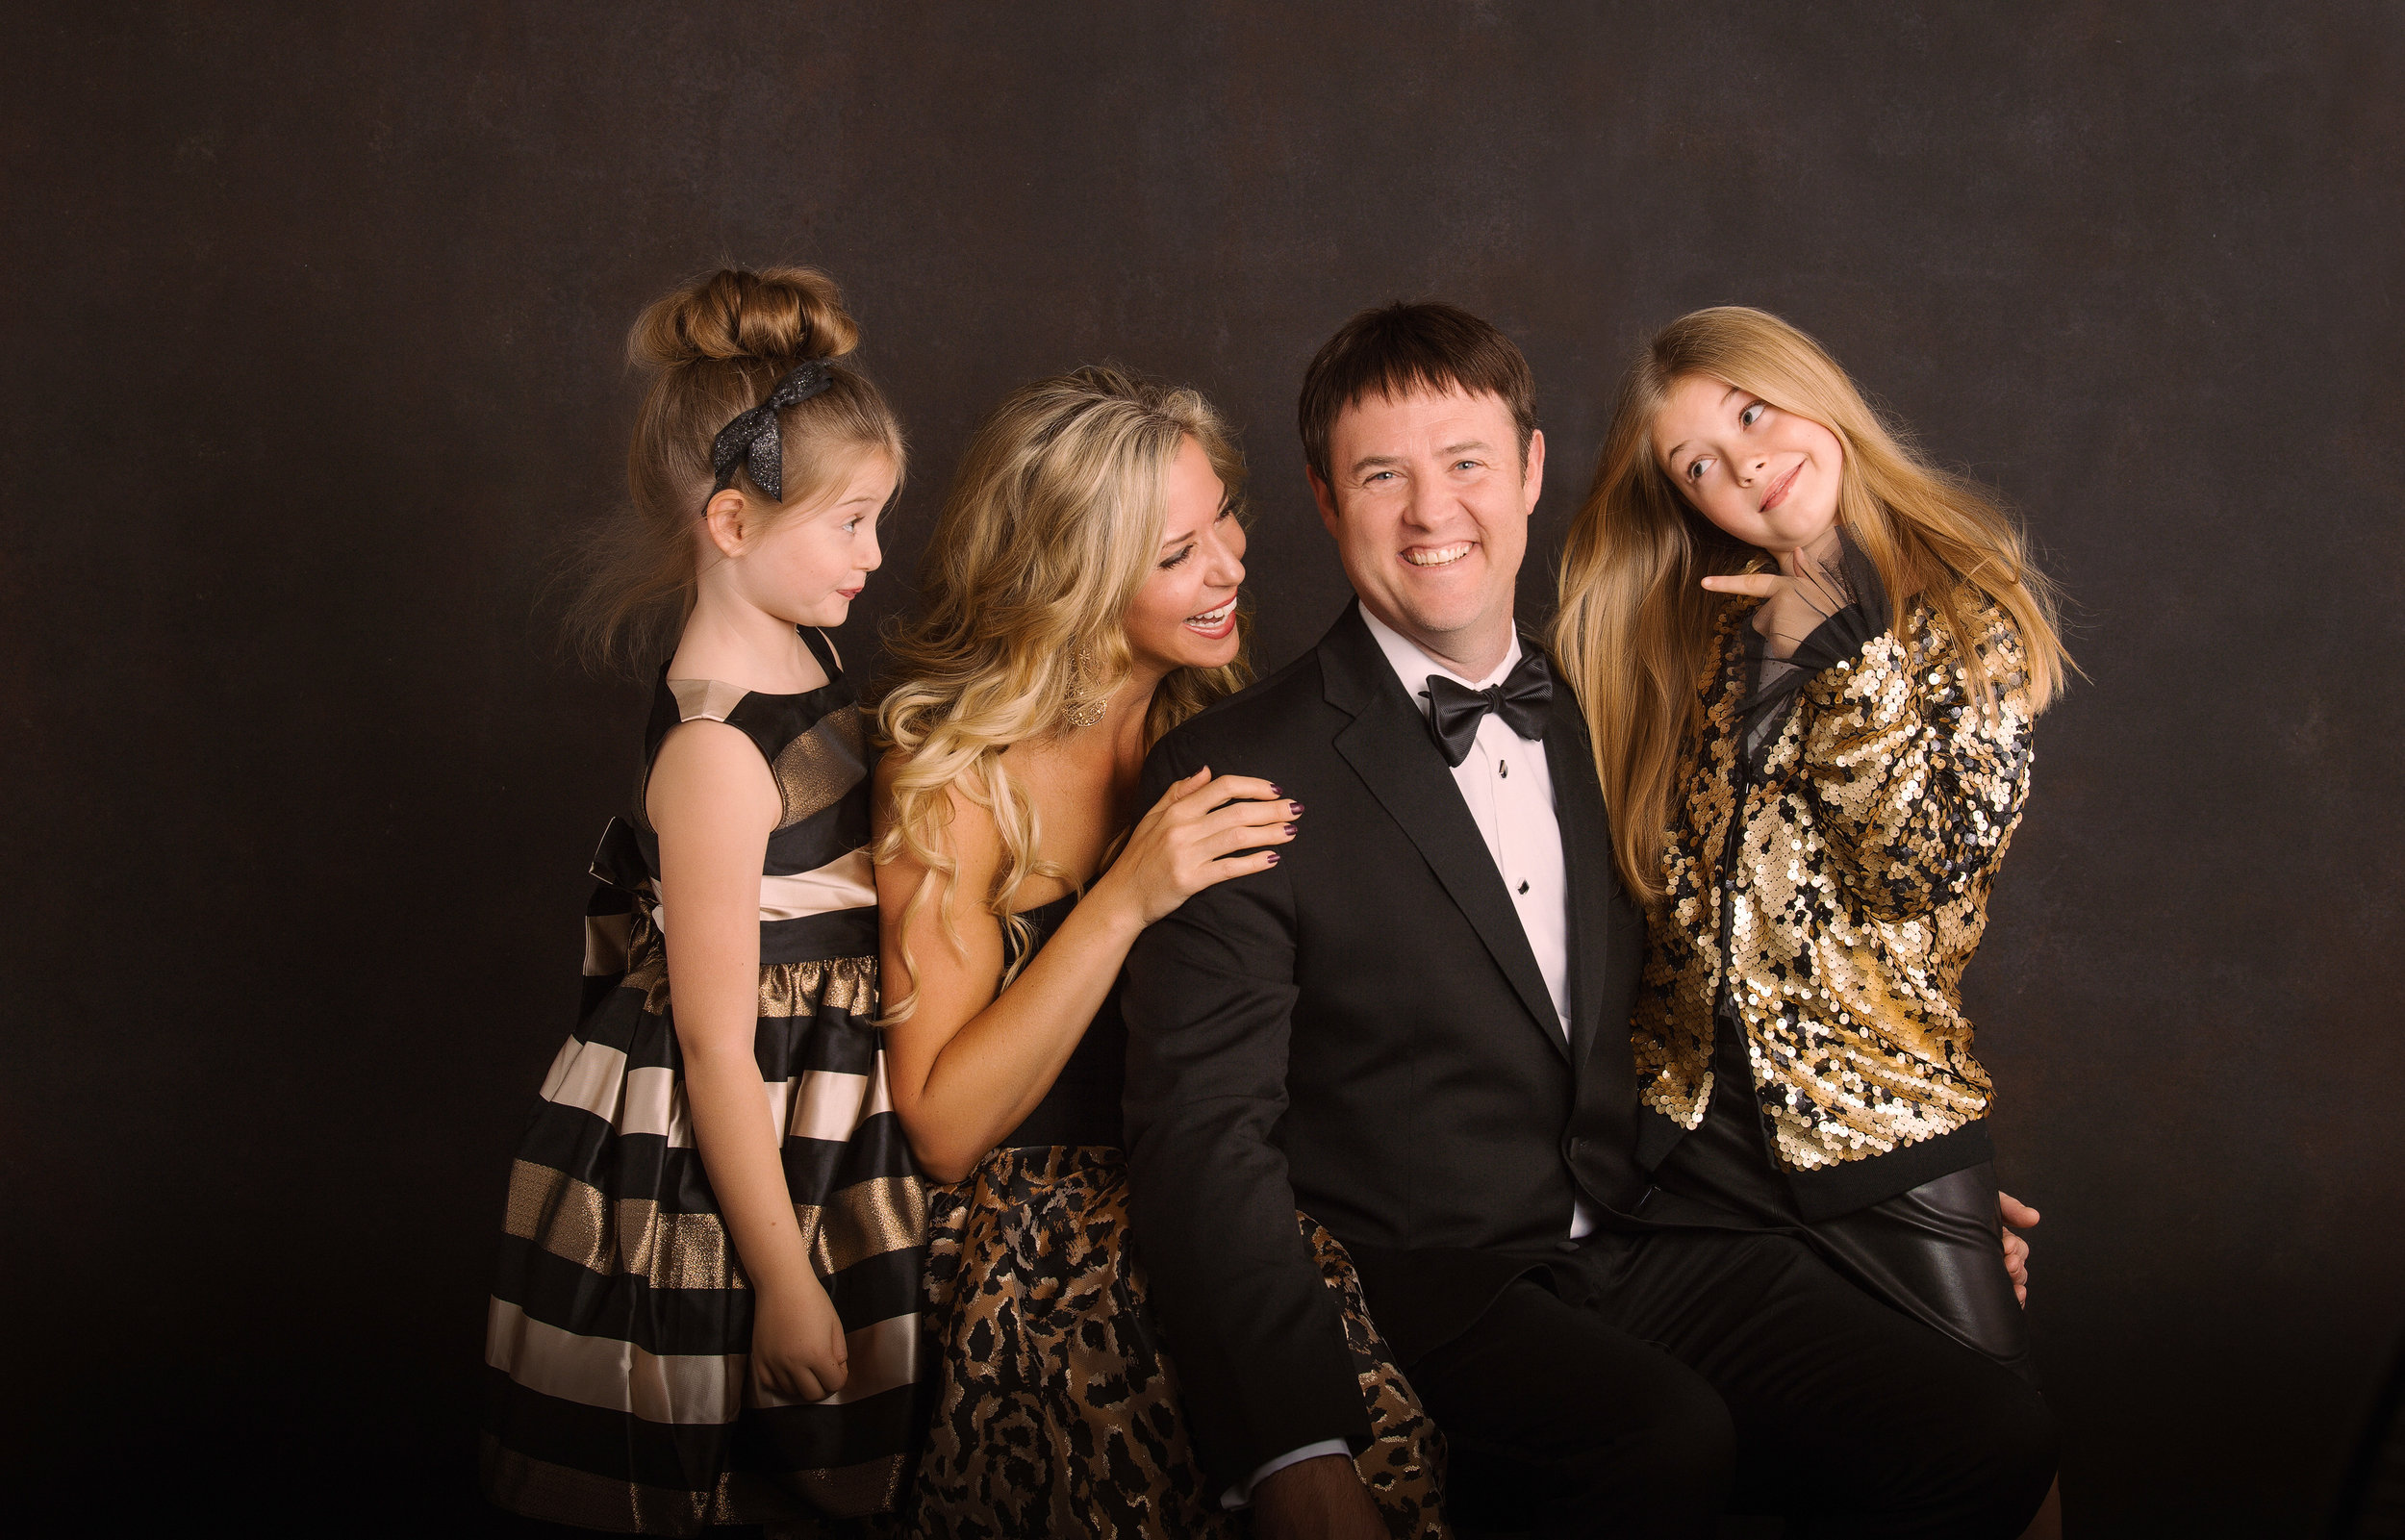 Formal Family Portraits in the studio featuring the Wadlow Family | pc:  StudioBportraits.com